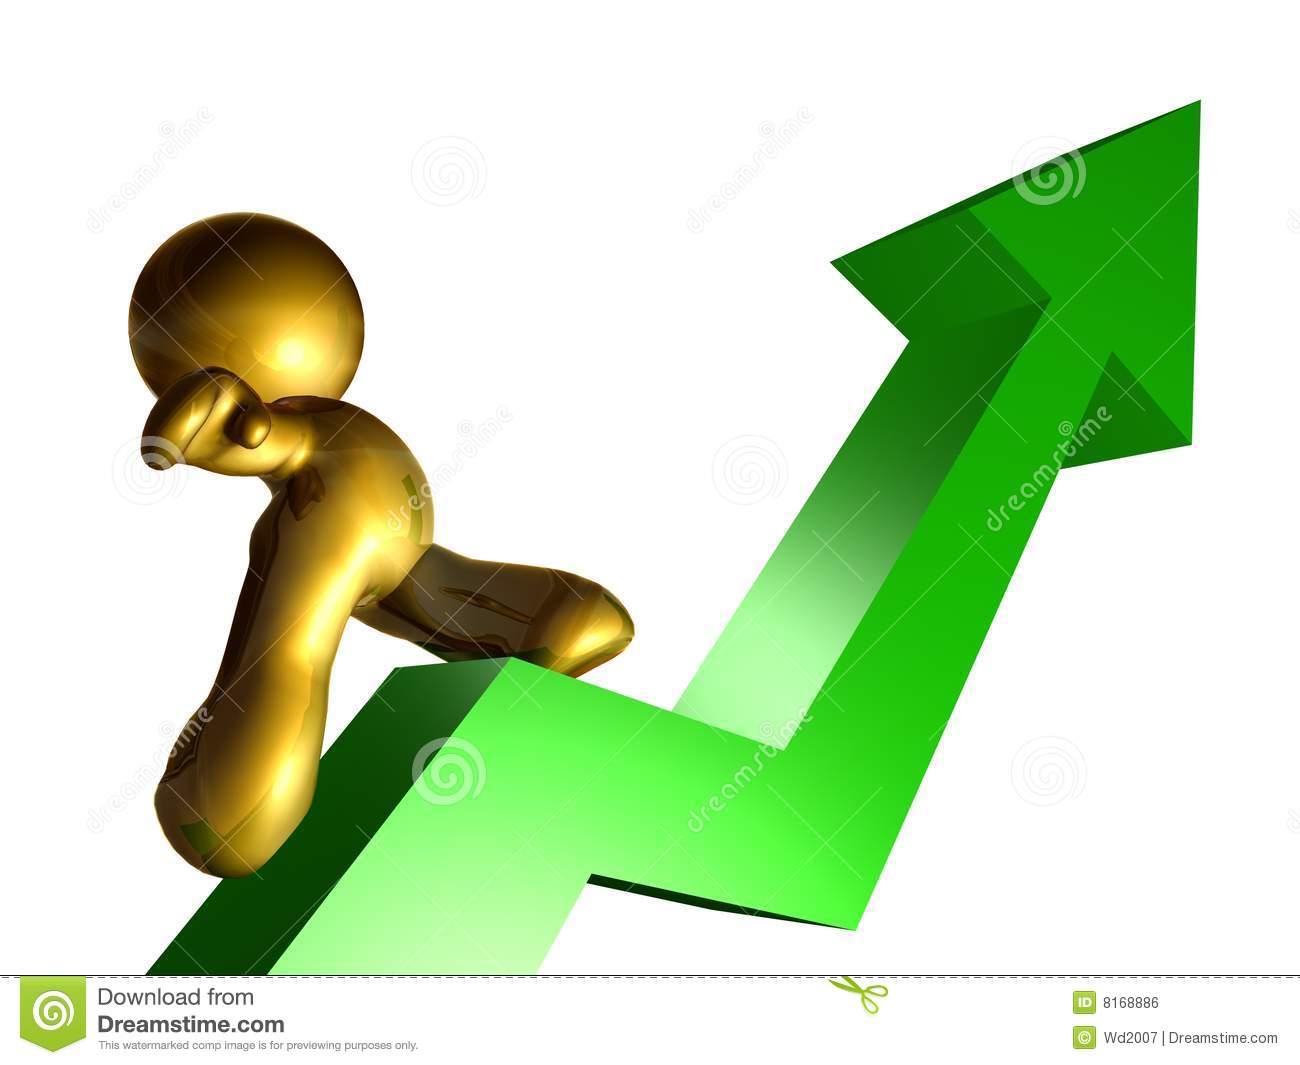 Upward trend clipart banner free download 95 Trend 20clipart | Tiny Clipart banner free download